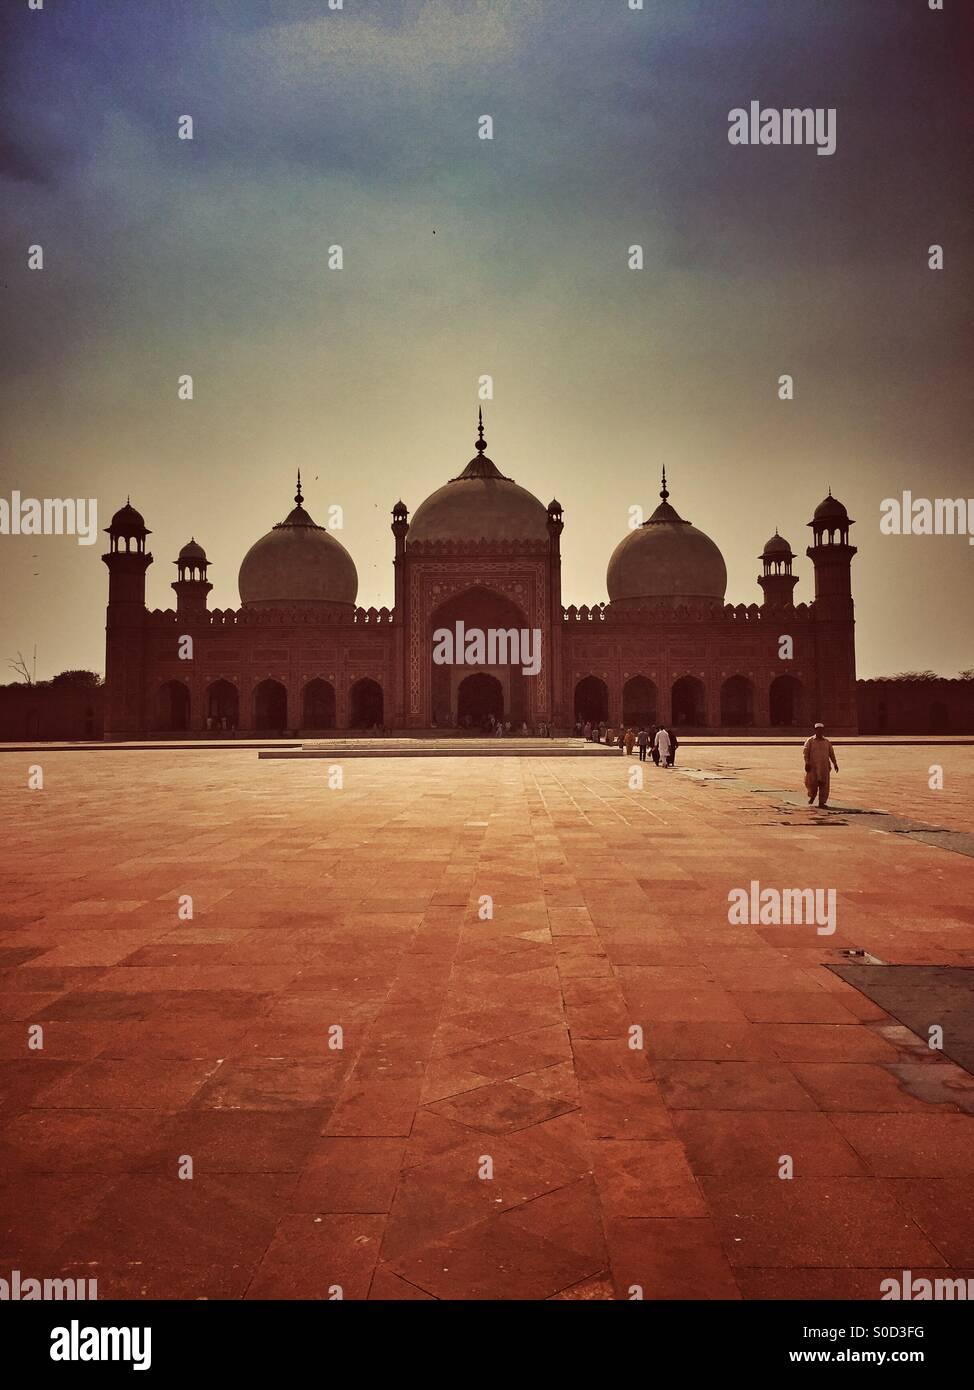 Badshahi mosque Lahore Pakistan - Stock Image